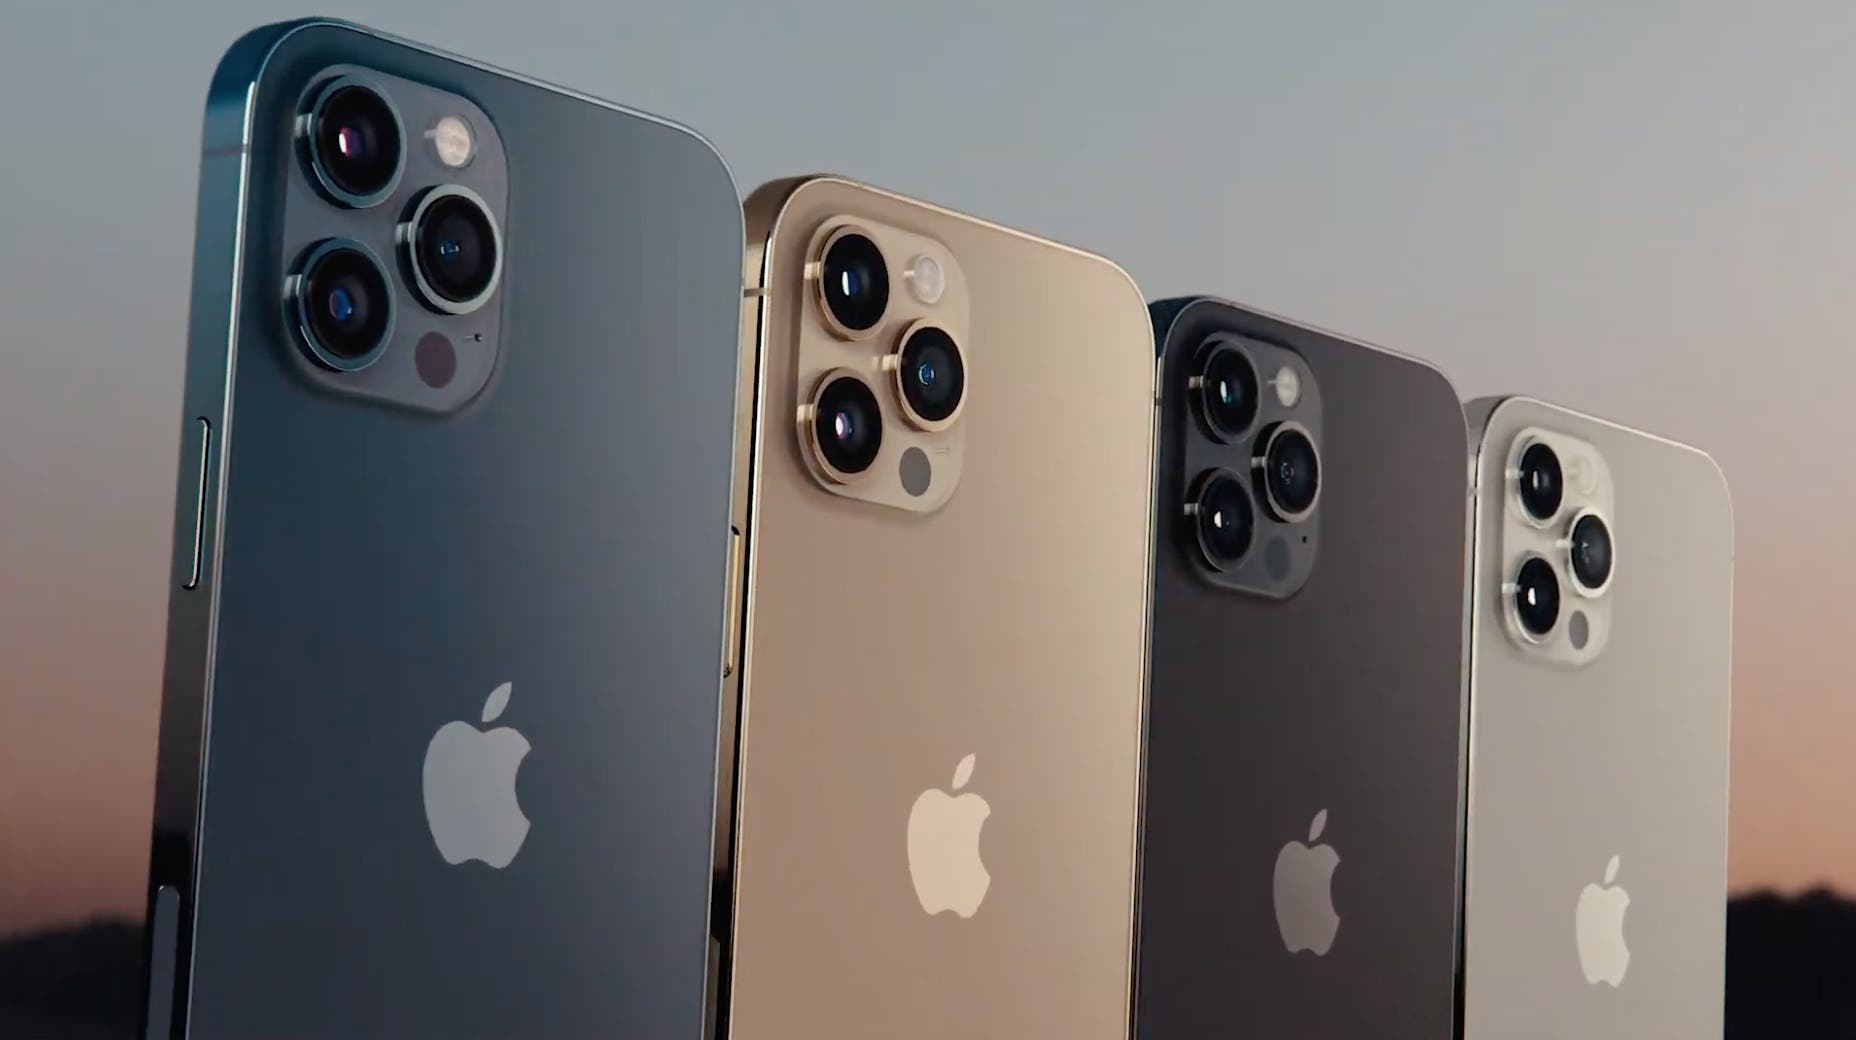 iPhone 12 reyes